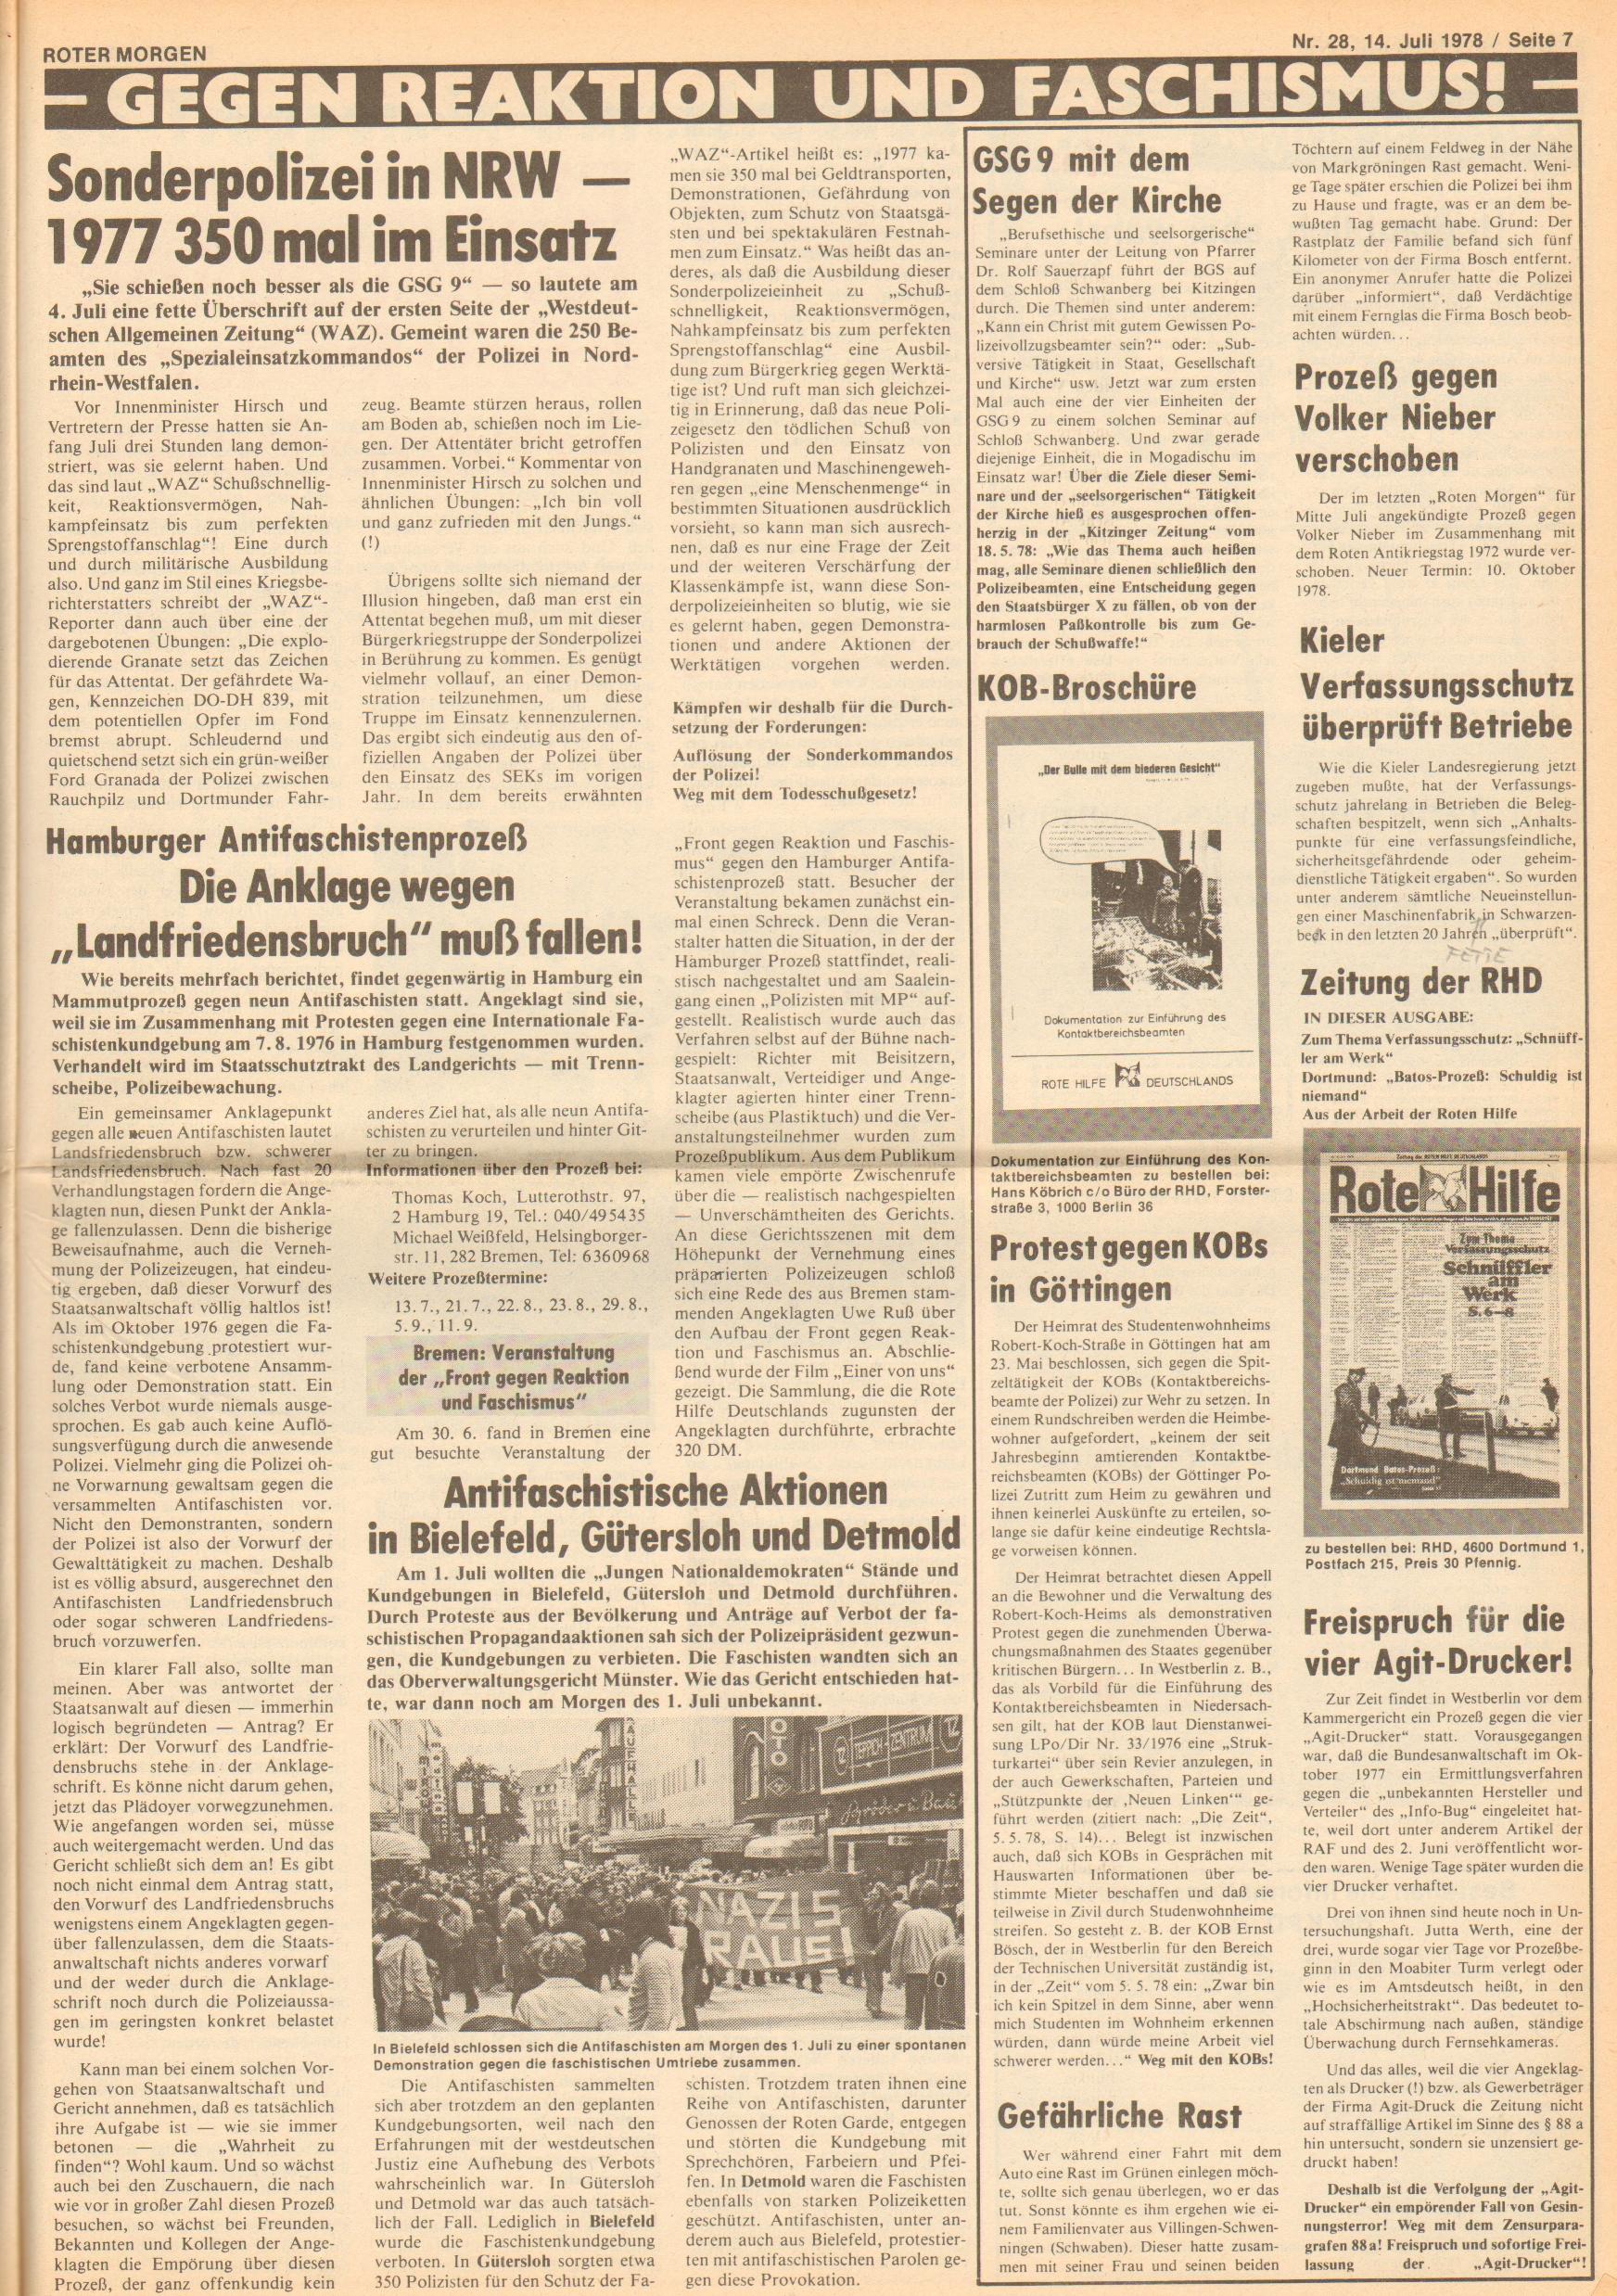 Roter Morgen, 12. Jg., 16. Juli 1978, Nr. 28, Seite 7